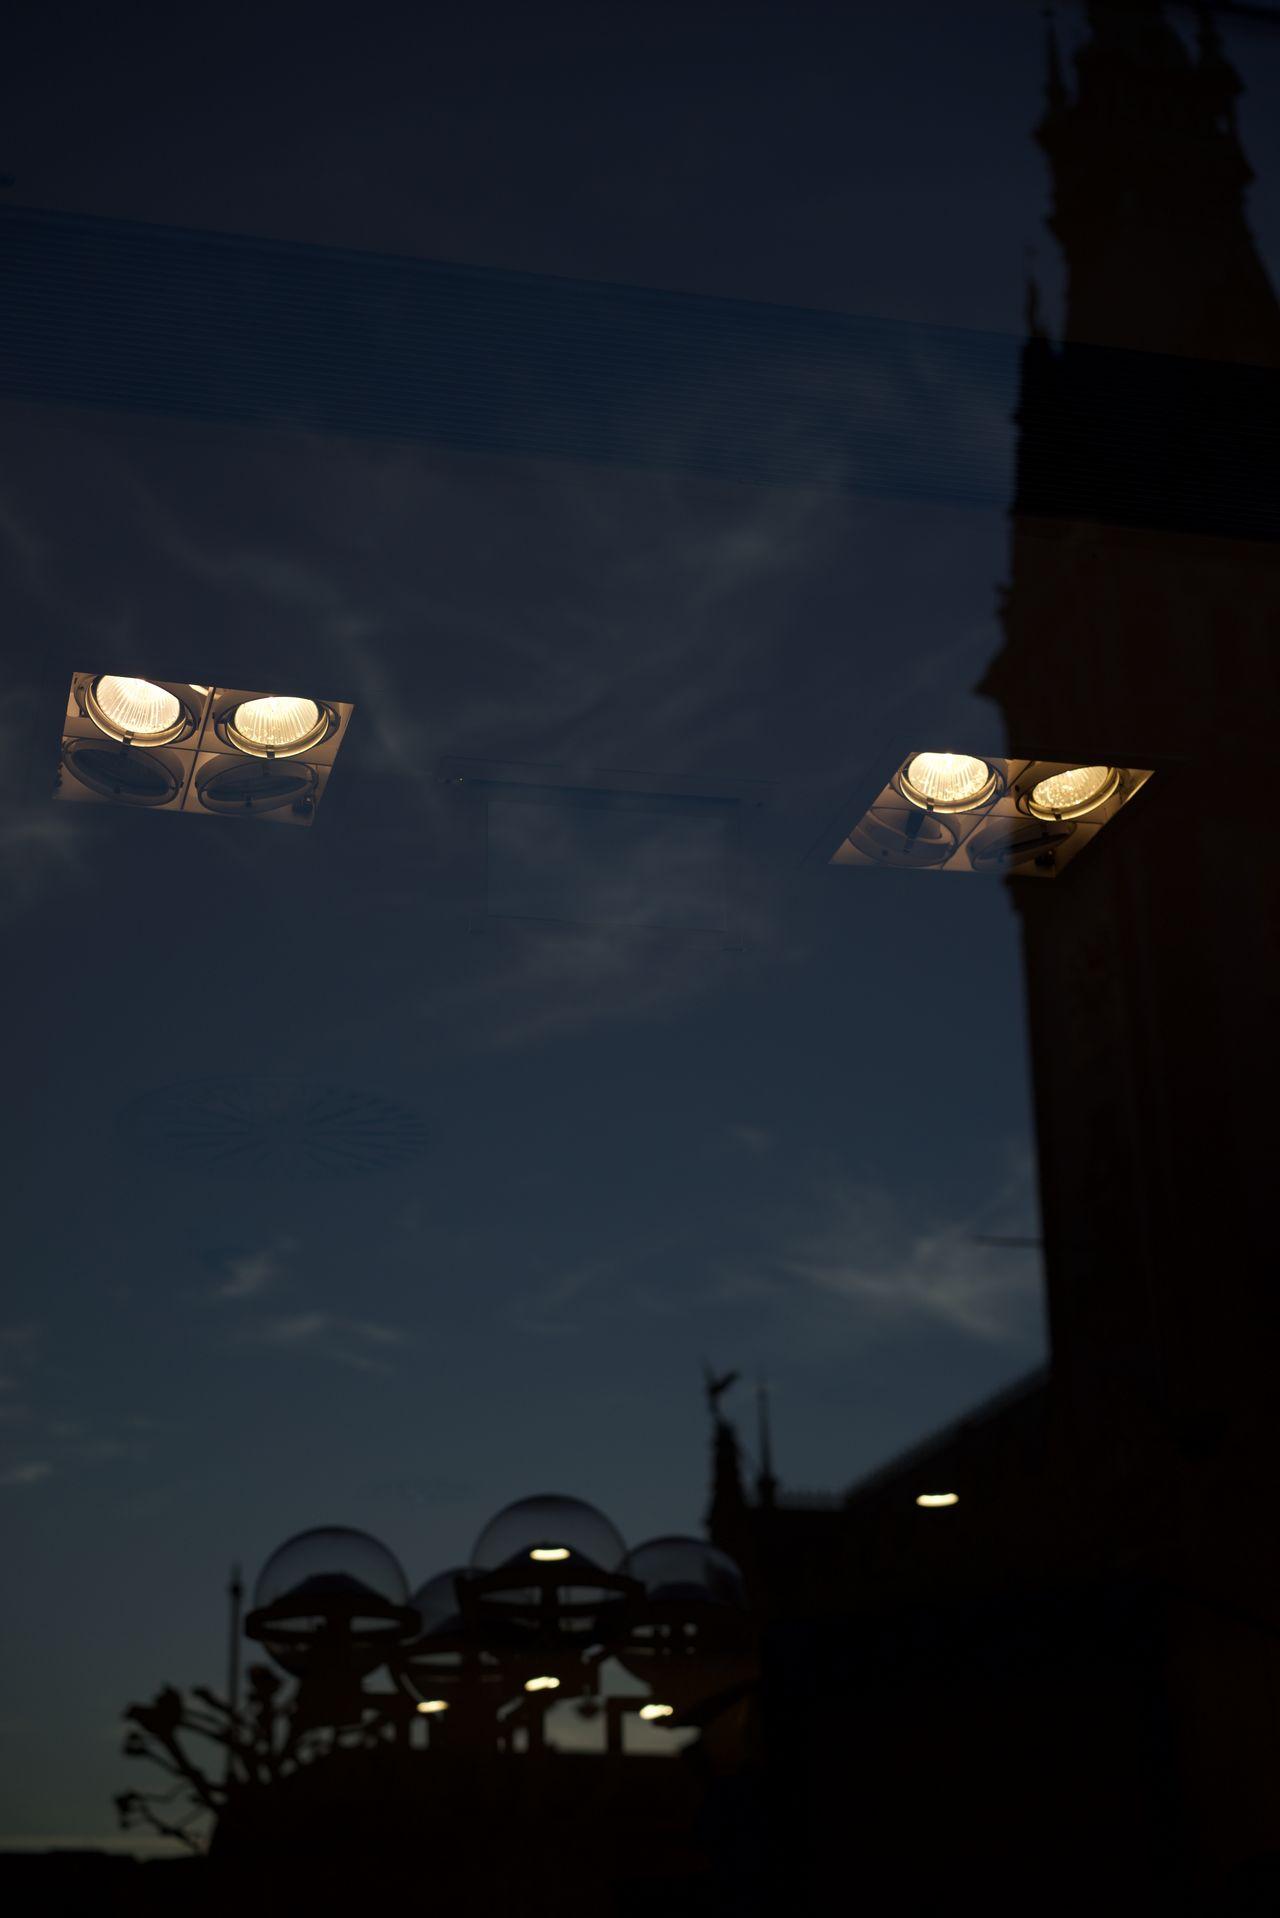 Lights mirroring in window Cloud - Sky Illuminated Lights Mirroring In Window Low Angle View No People Outdoors Reflection Sky Spotlights